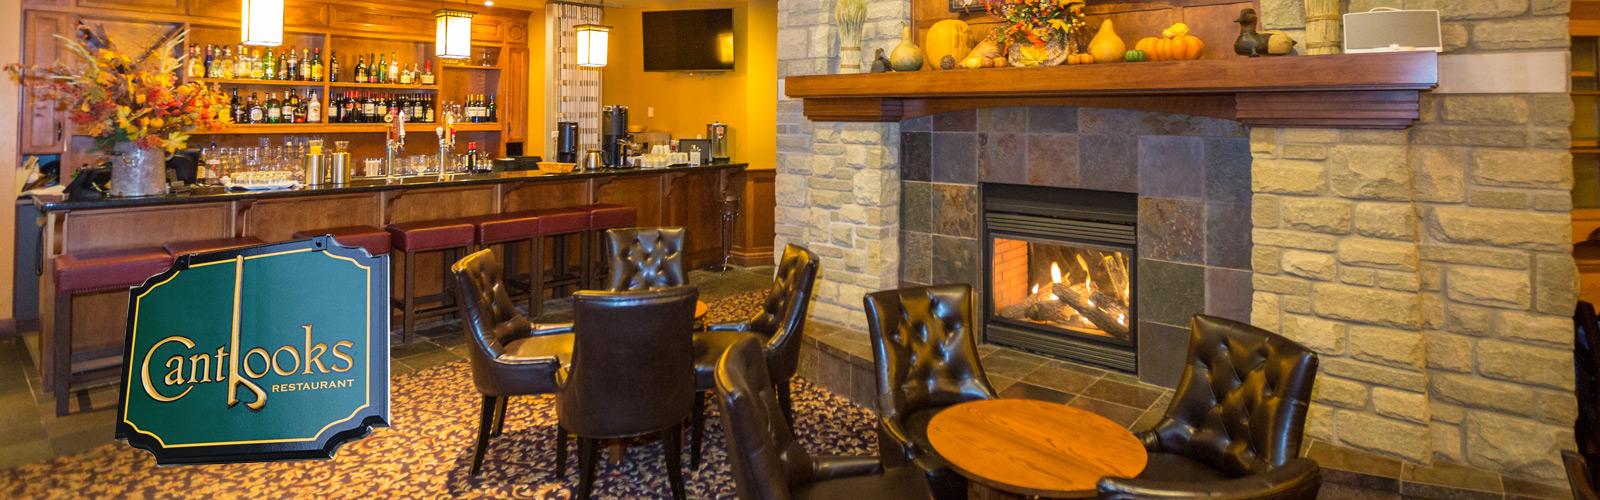 Ottawa Pubs & Cafes Canthooks Lounge